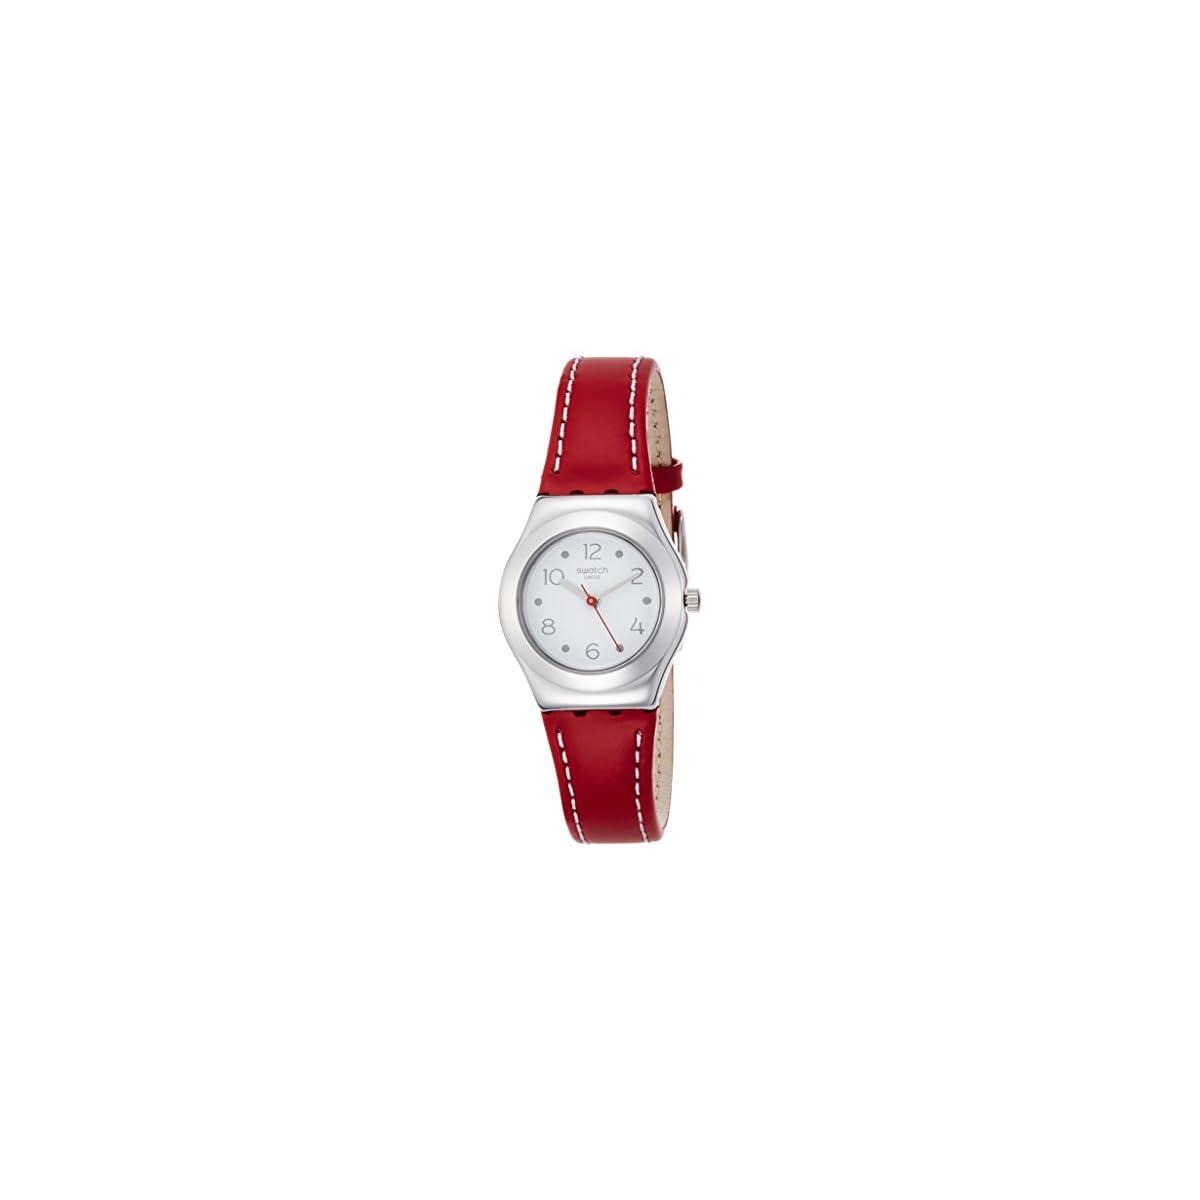 41YDx4VXaPL. SS1200  - Reloj Swatch - Mujer YSS307